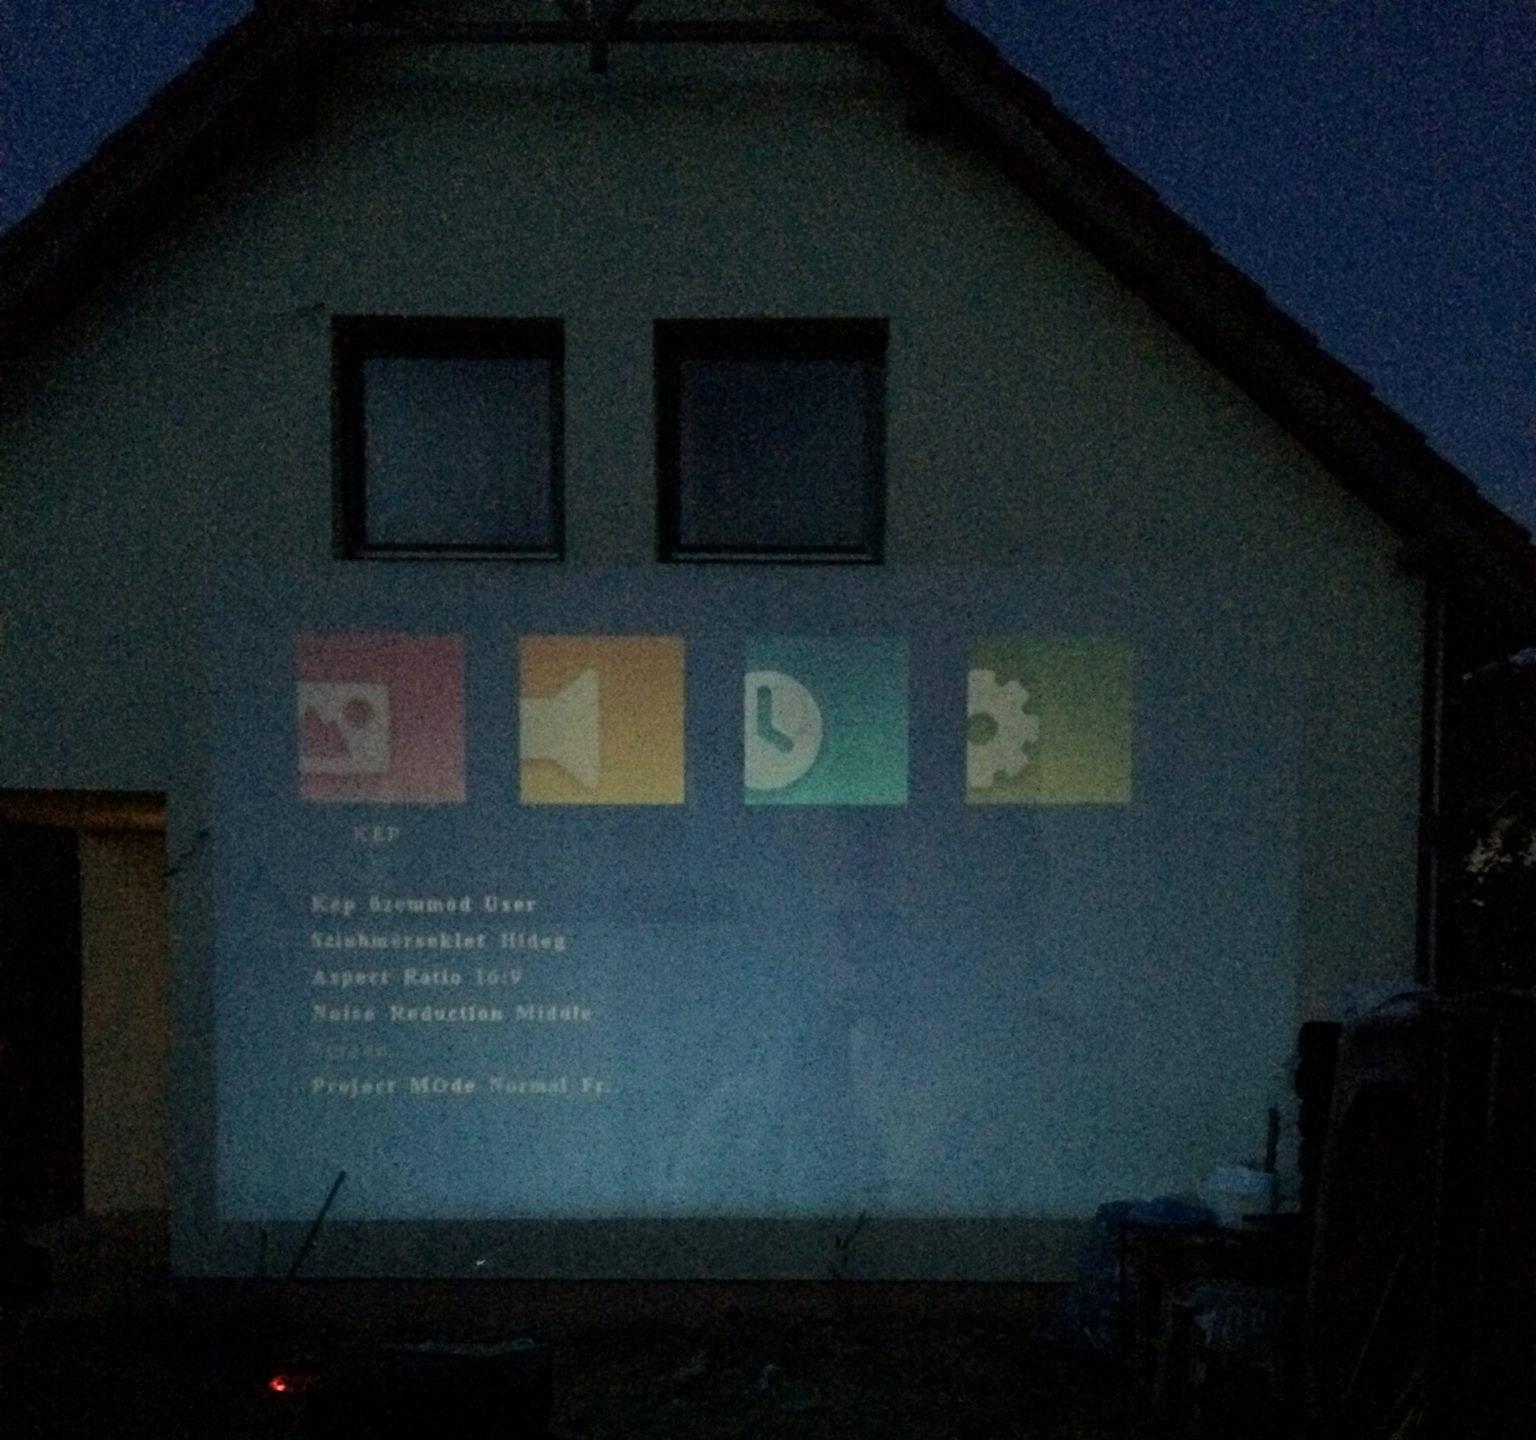 hazimozi-led-projector-gm60-hazra-vetites-2.jpg